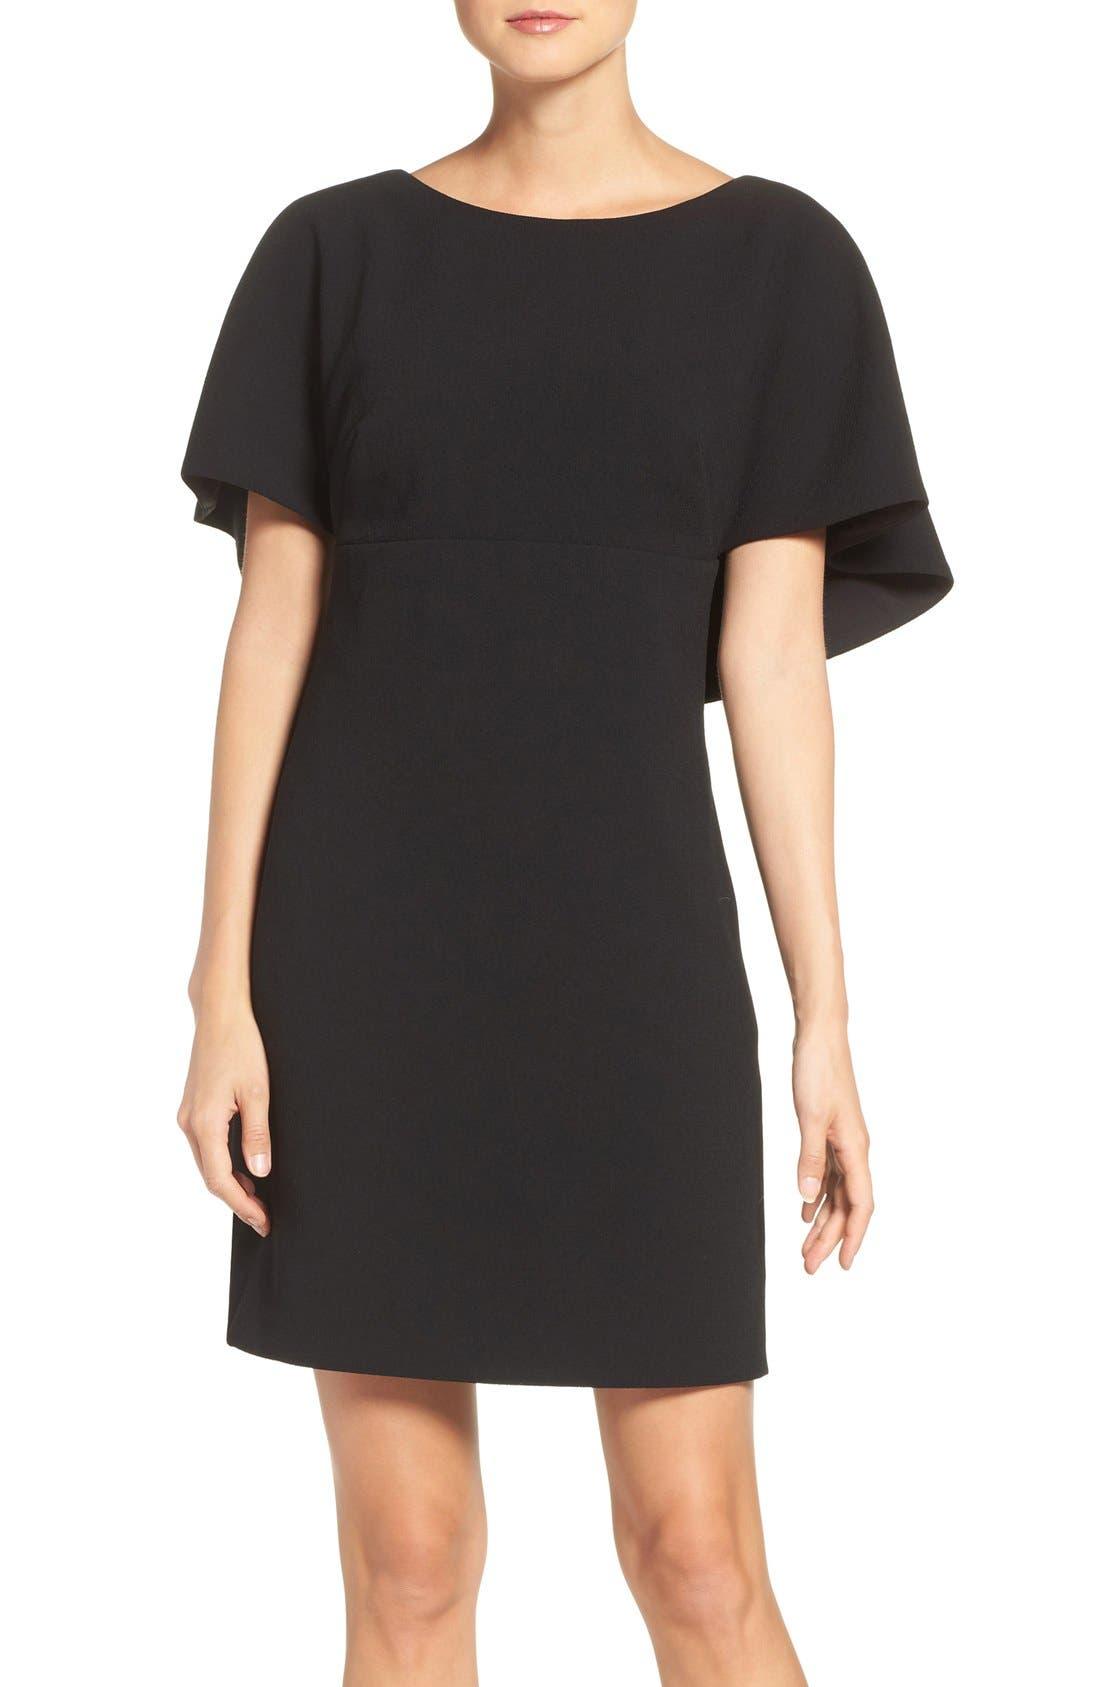 Alternate Image 1 Selected - Eliza J Cape A-Line Dress